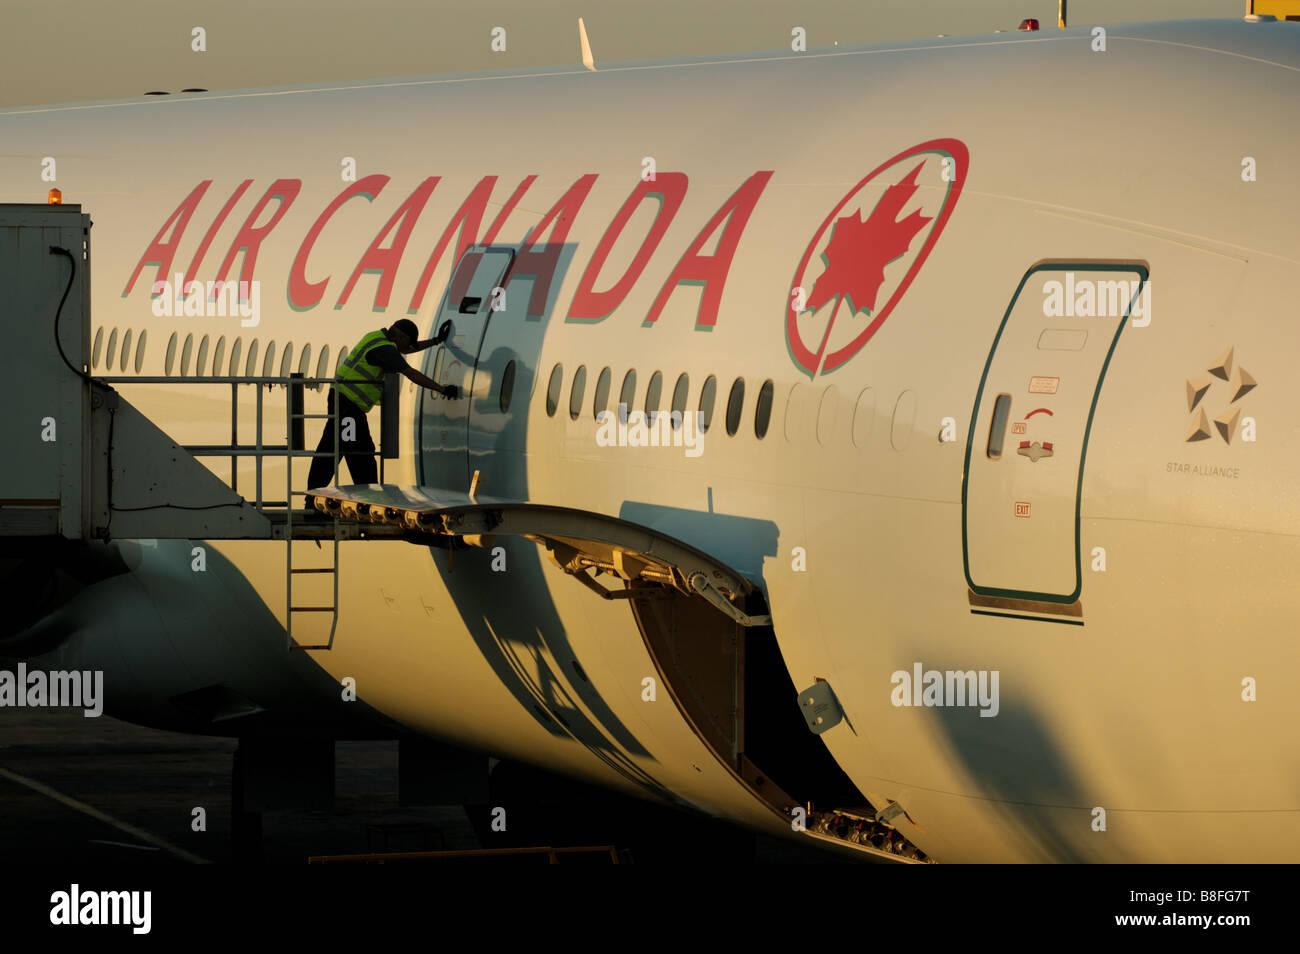 An airport technician closing the door on an Air Canada plane Stock Photo